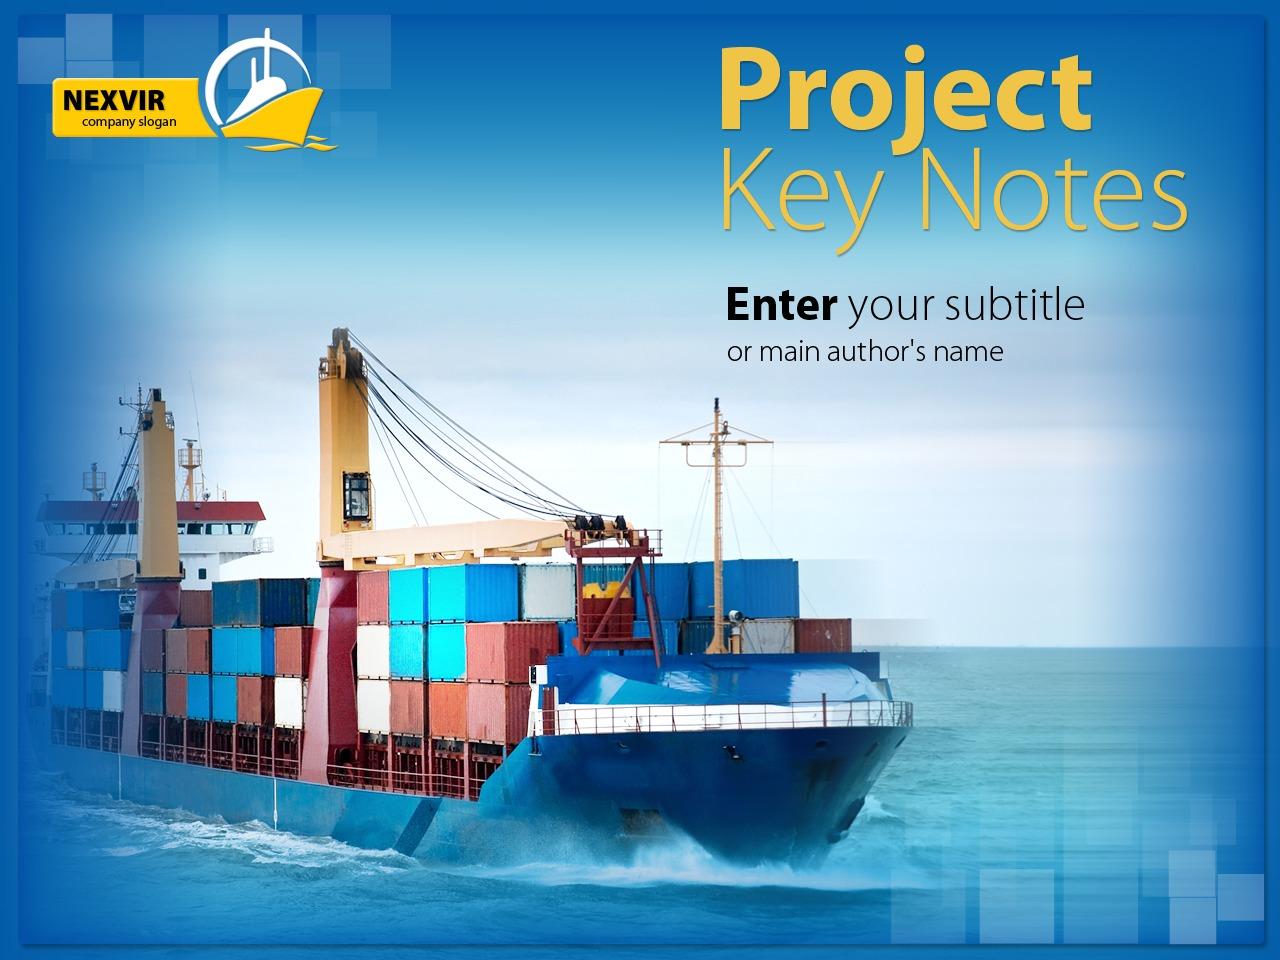 Plantilla PowerPoint #26283 para Sitio de Transporte marítimo